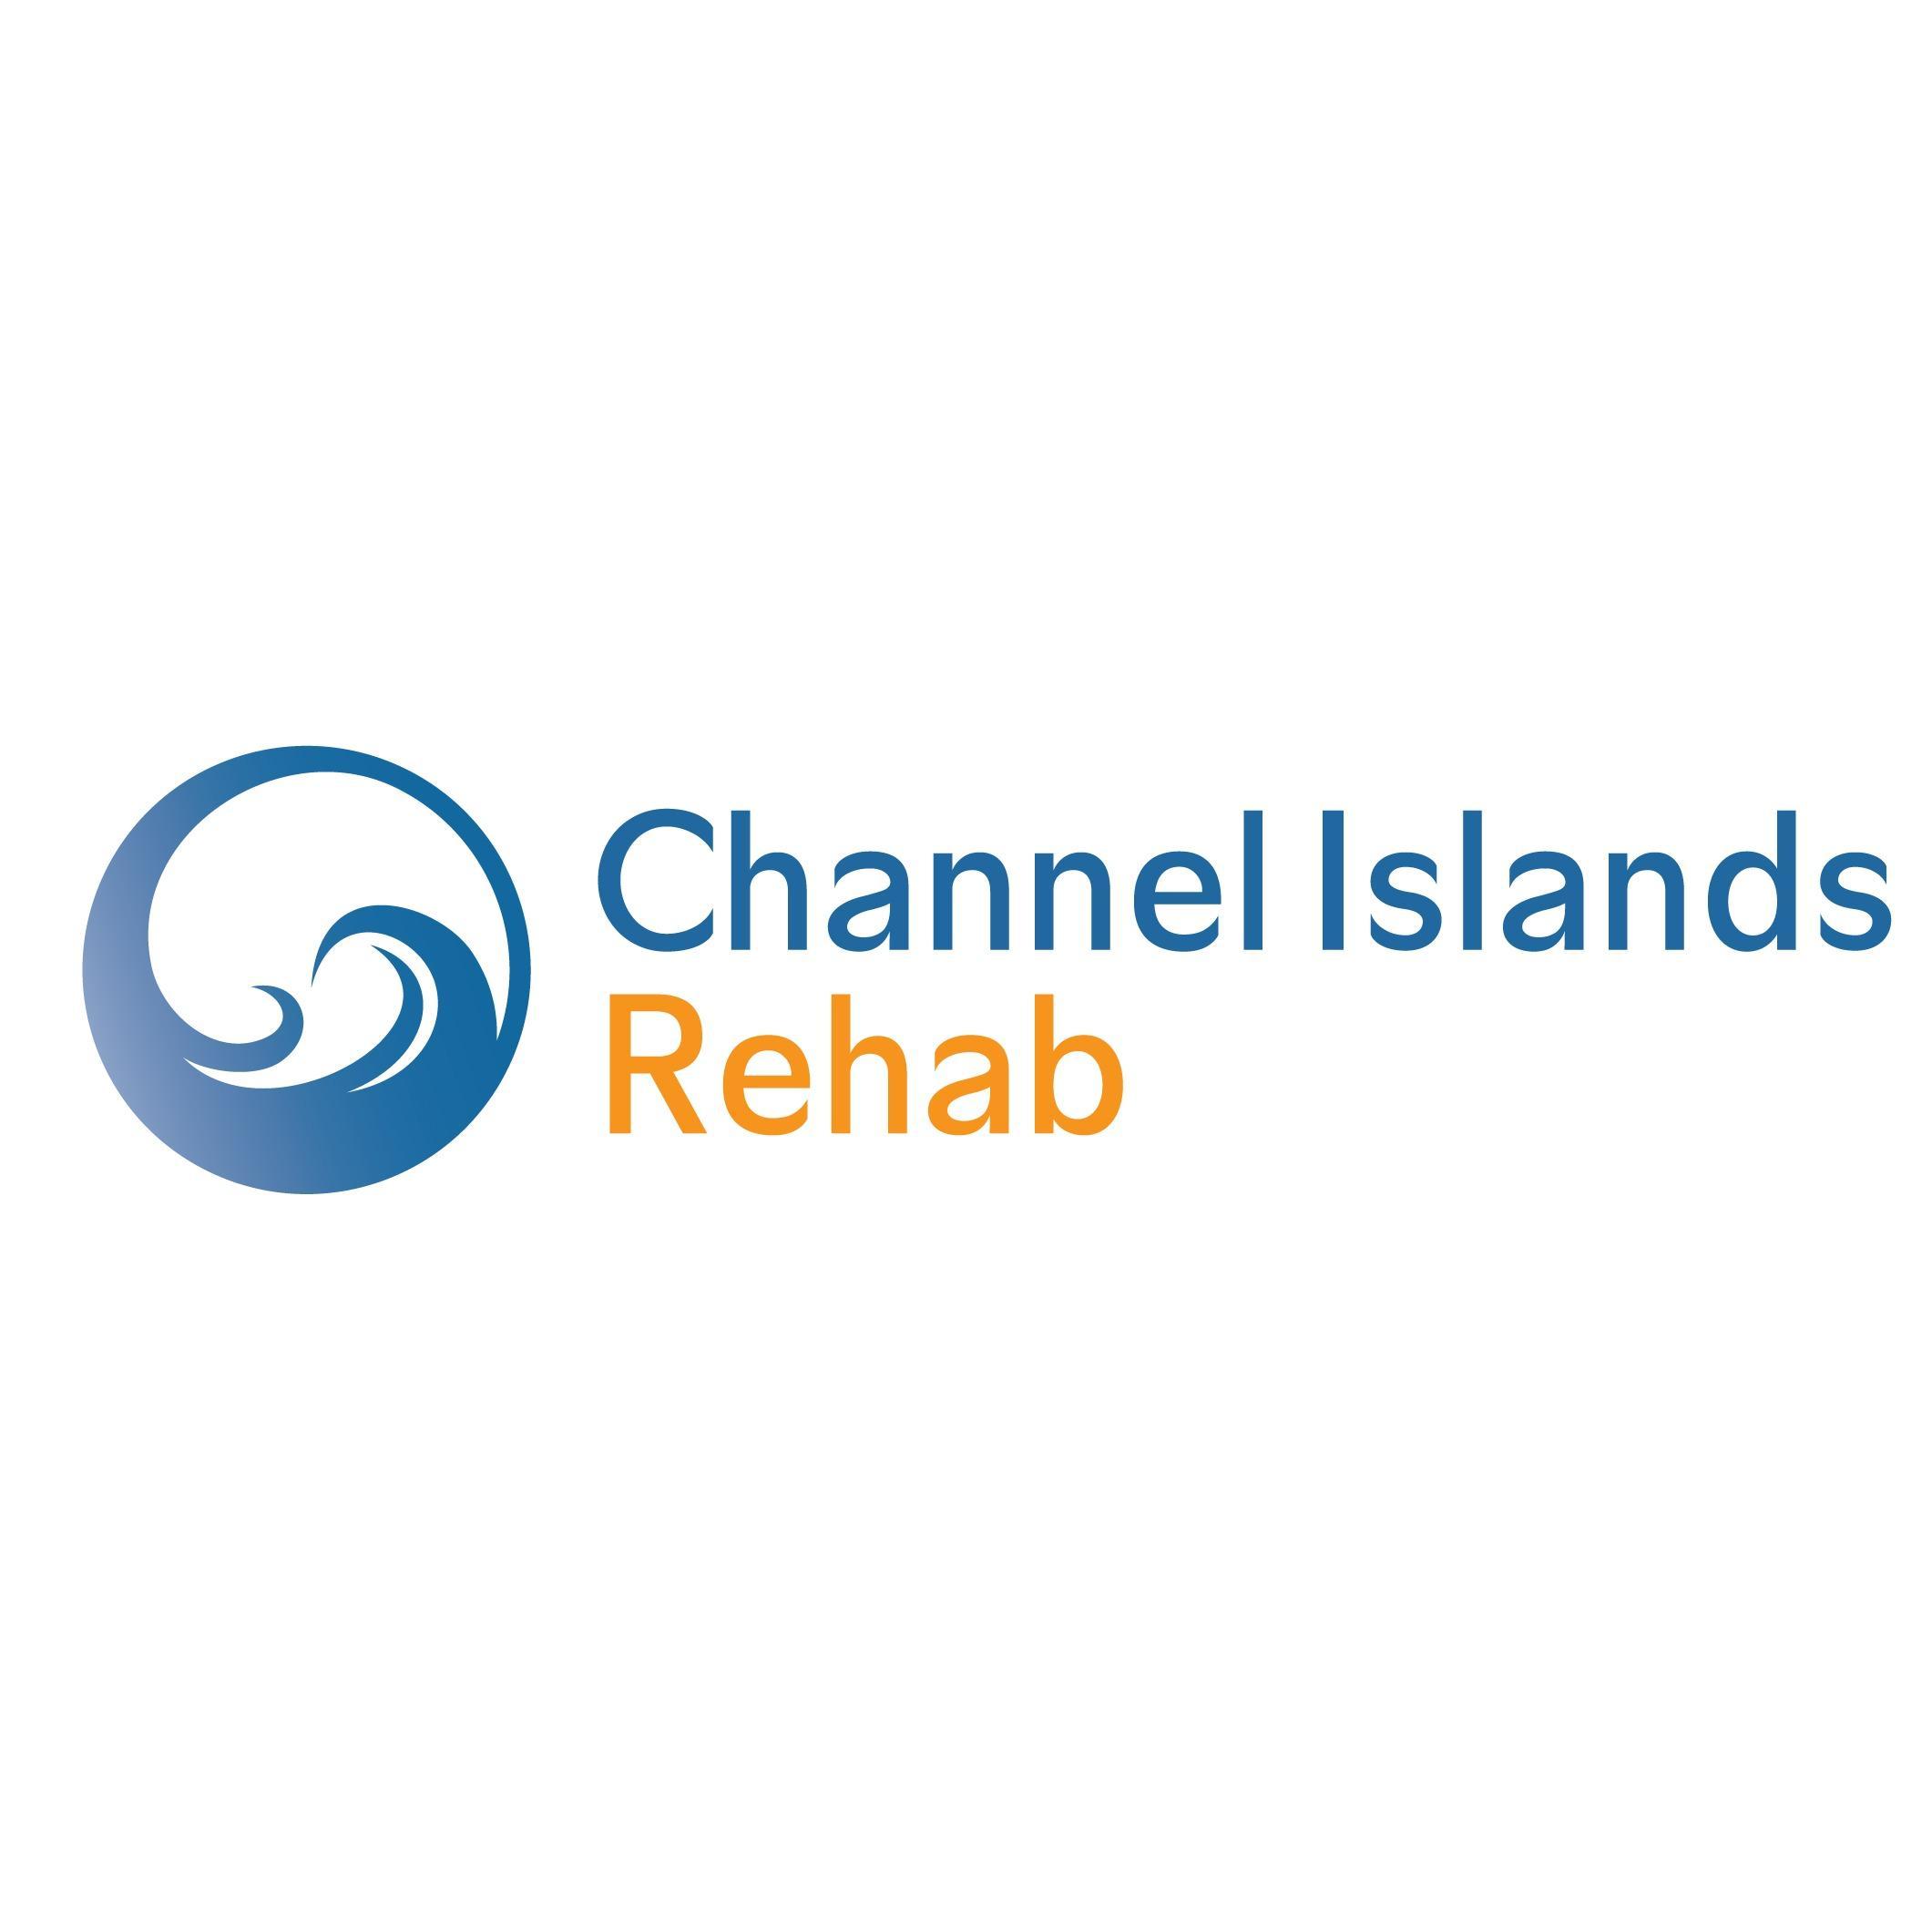 Channel Islands Rehab - Oxnard, CA 93035 - (855)305-5840 | ShowMeLocal.com